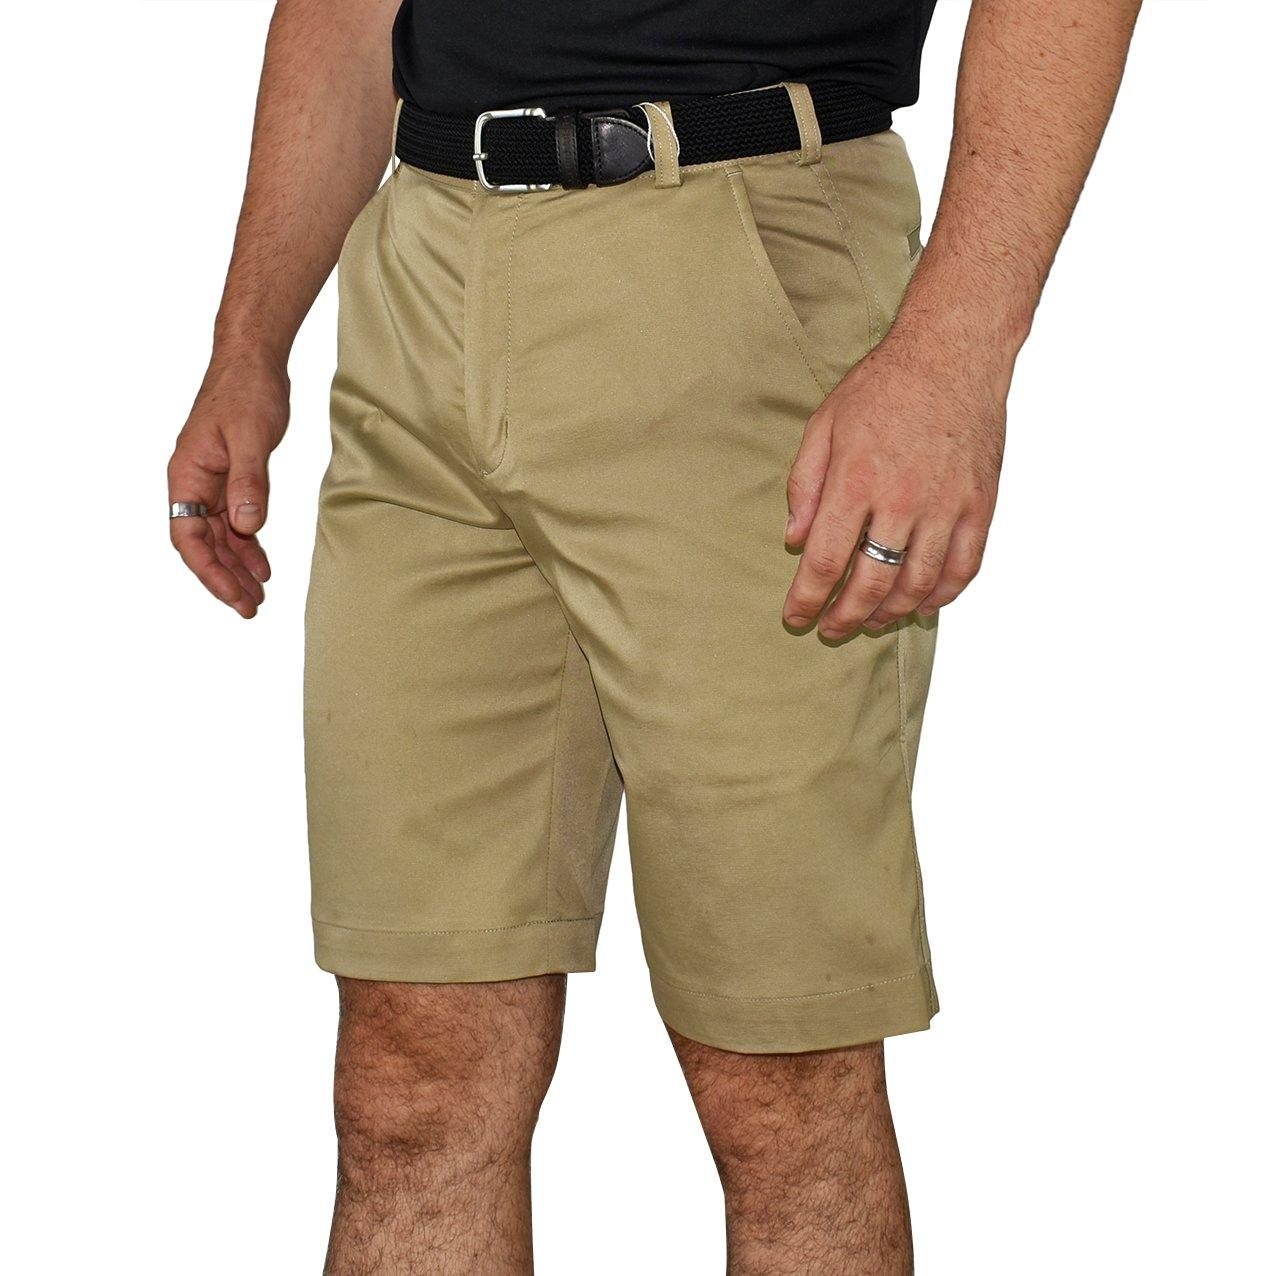 Nike Golf Flat Front Tech Golf Shorts - Khaki - Image 1